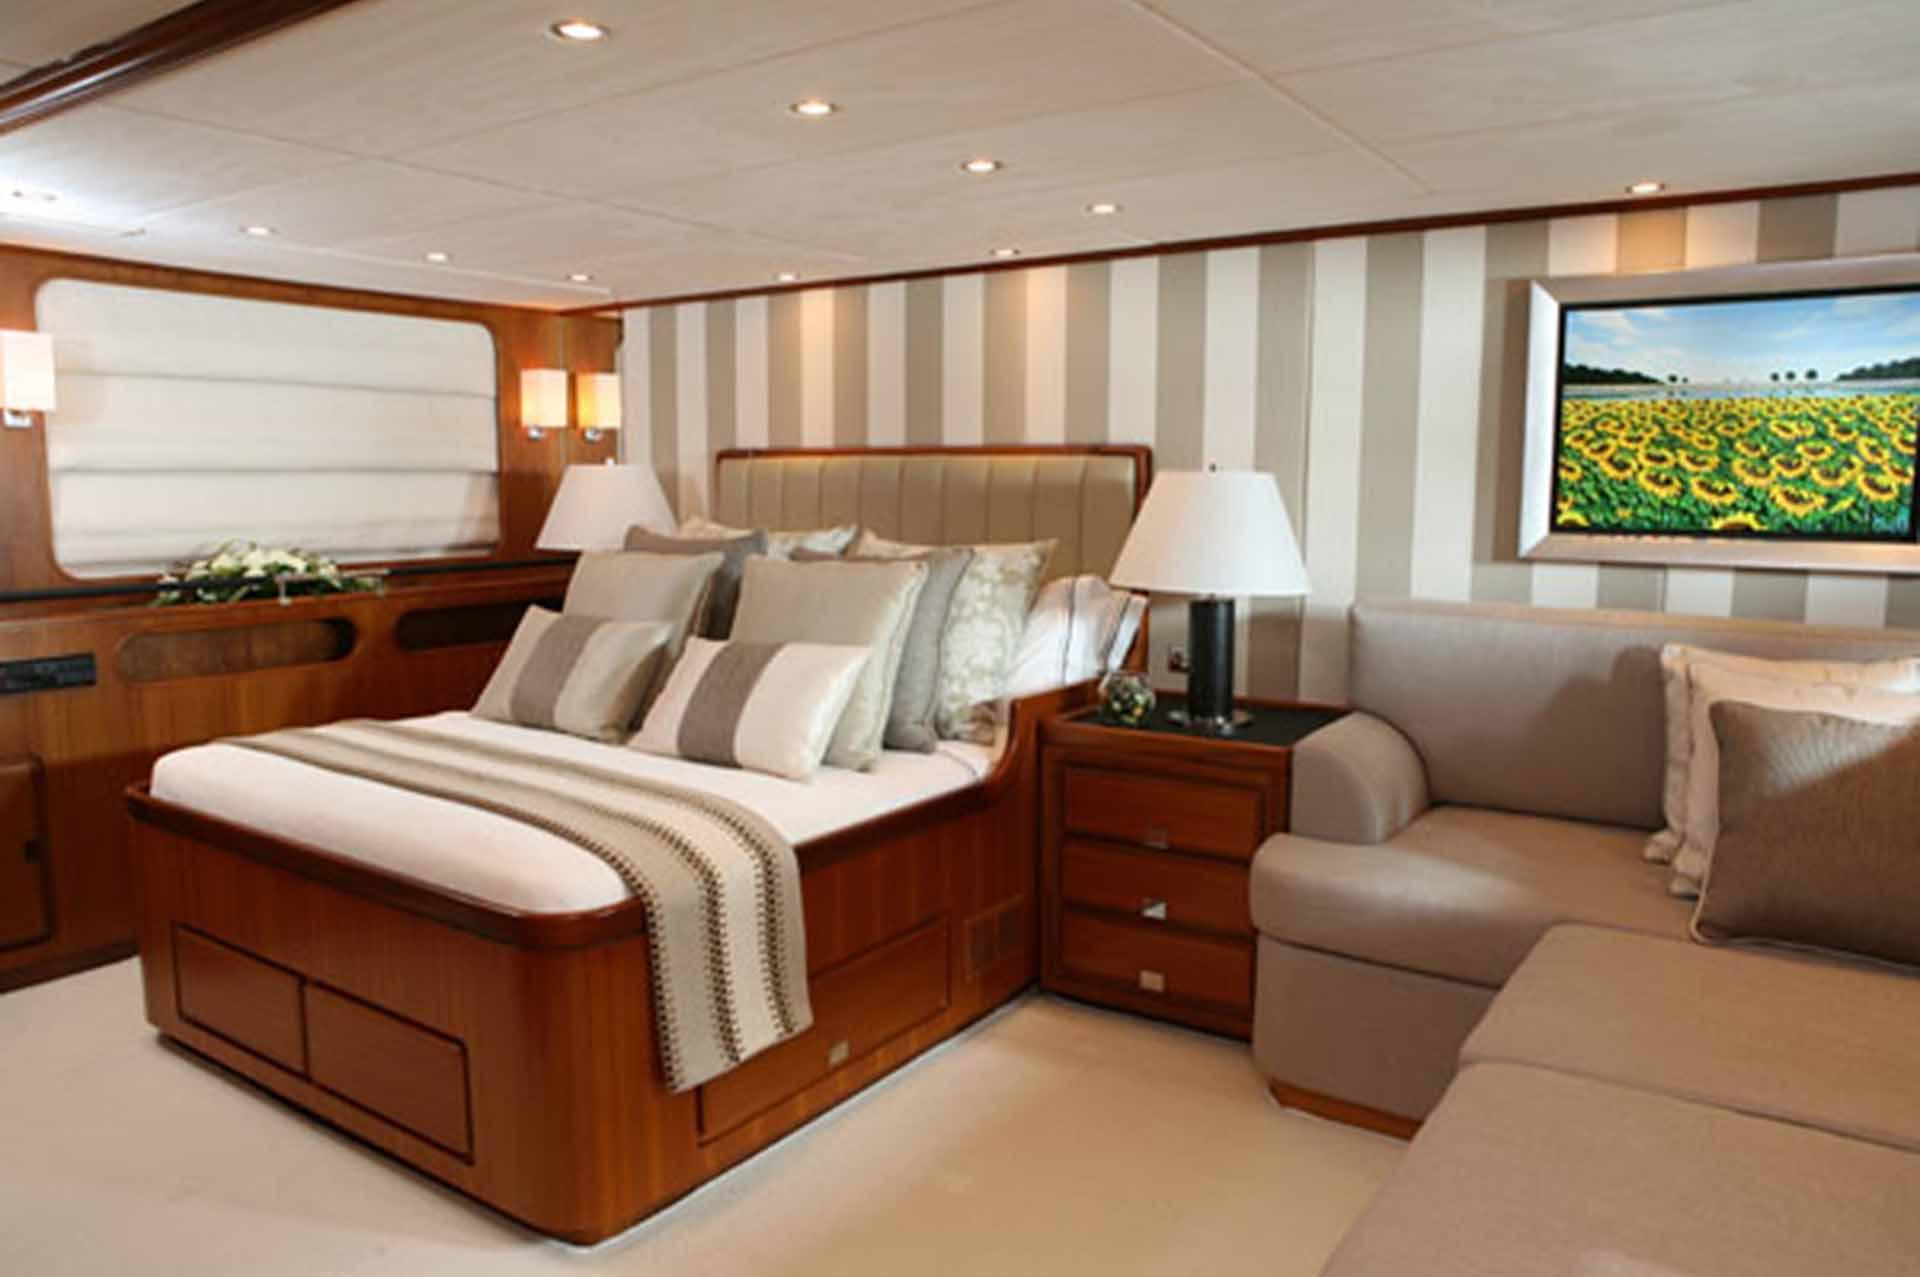 Fabulous accommodation with luxury amenities